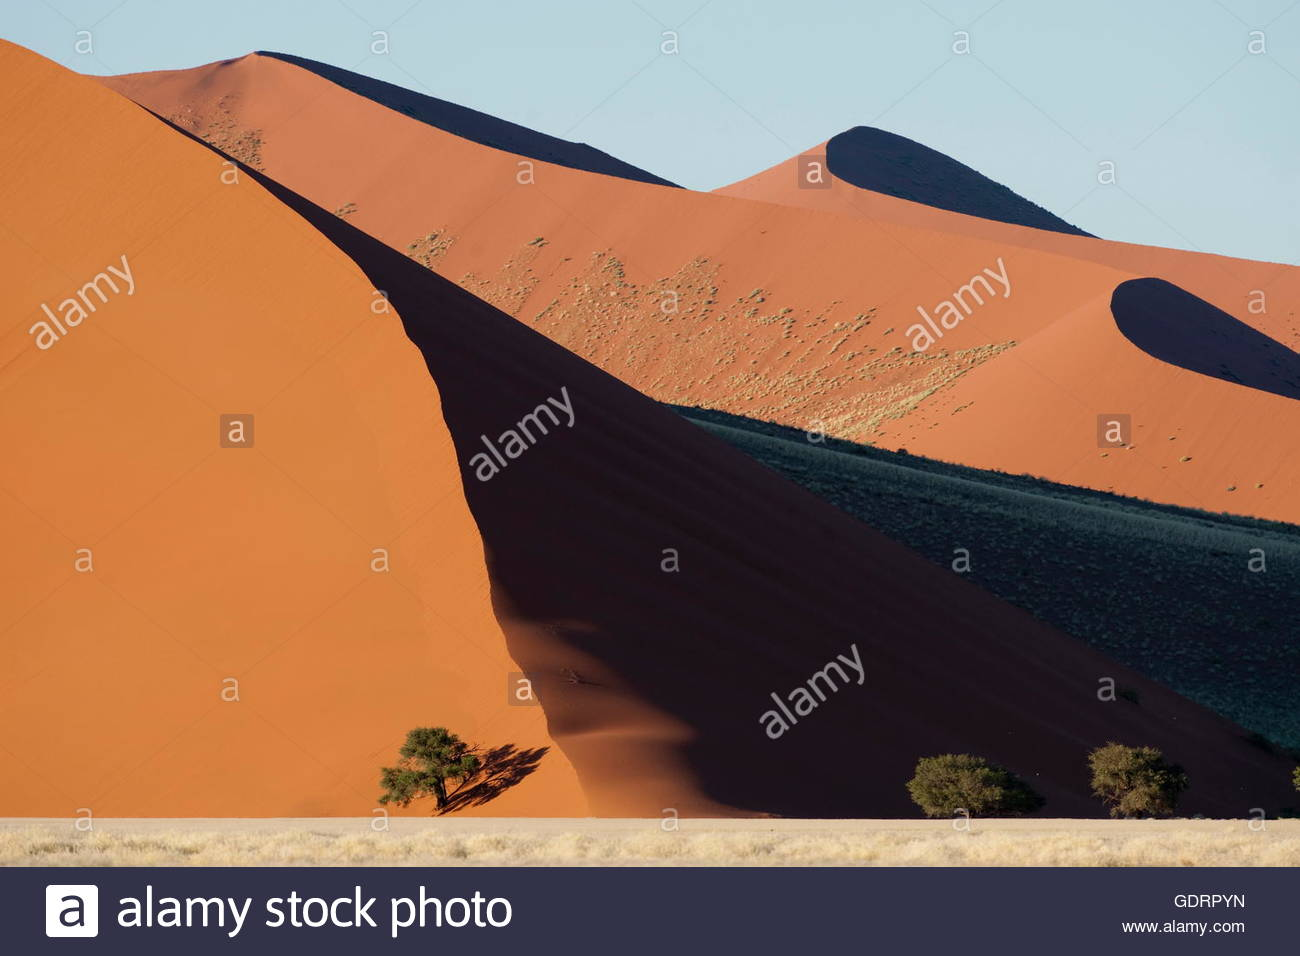 geography / travel, Namibia, Red sand dunes at Sossusvlei in Naukluft Park Namib desert Namibia - Stock Image